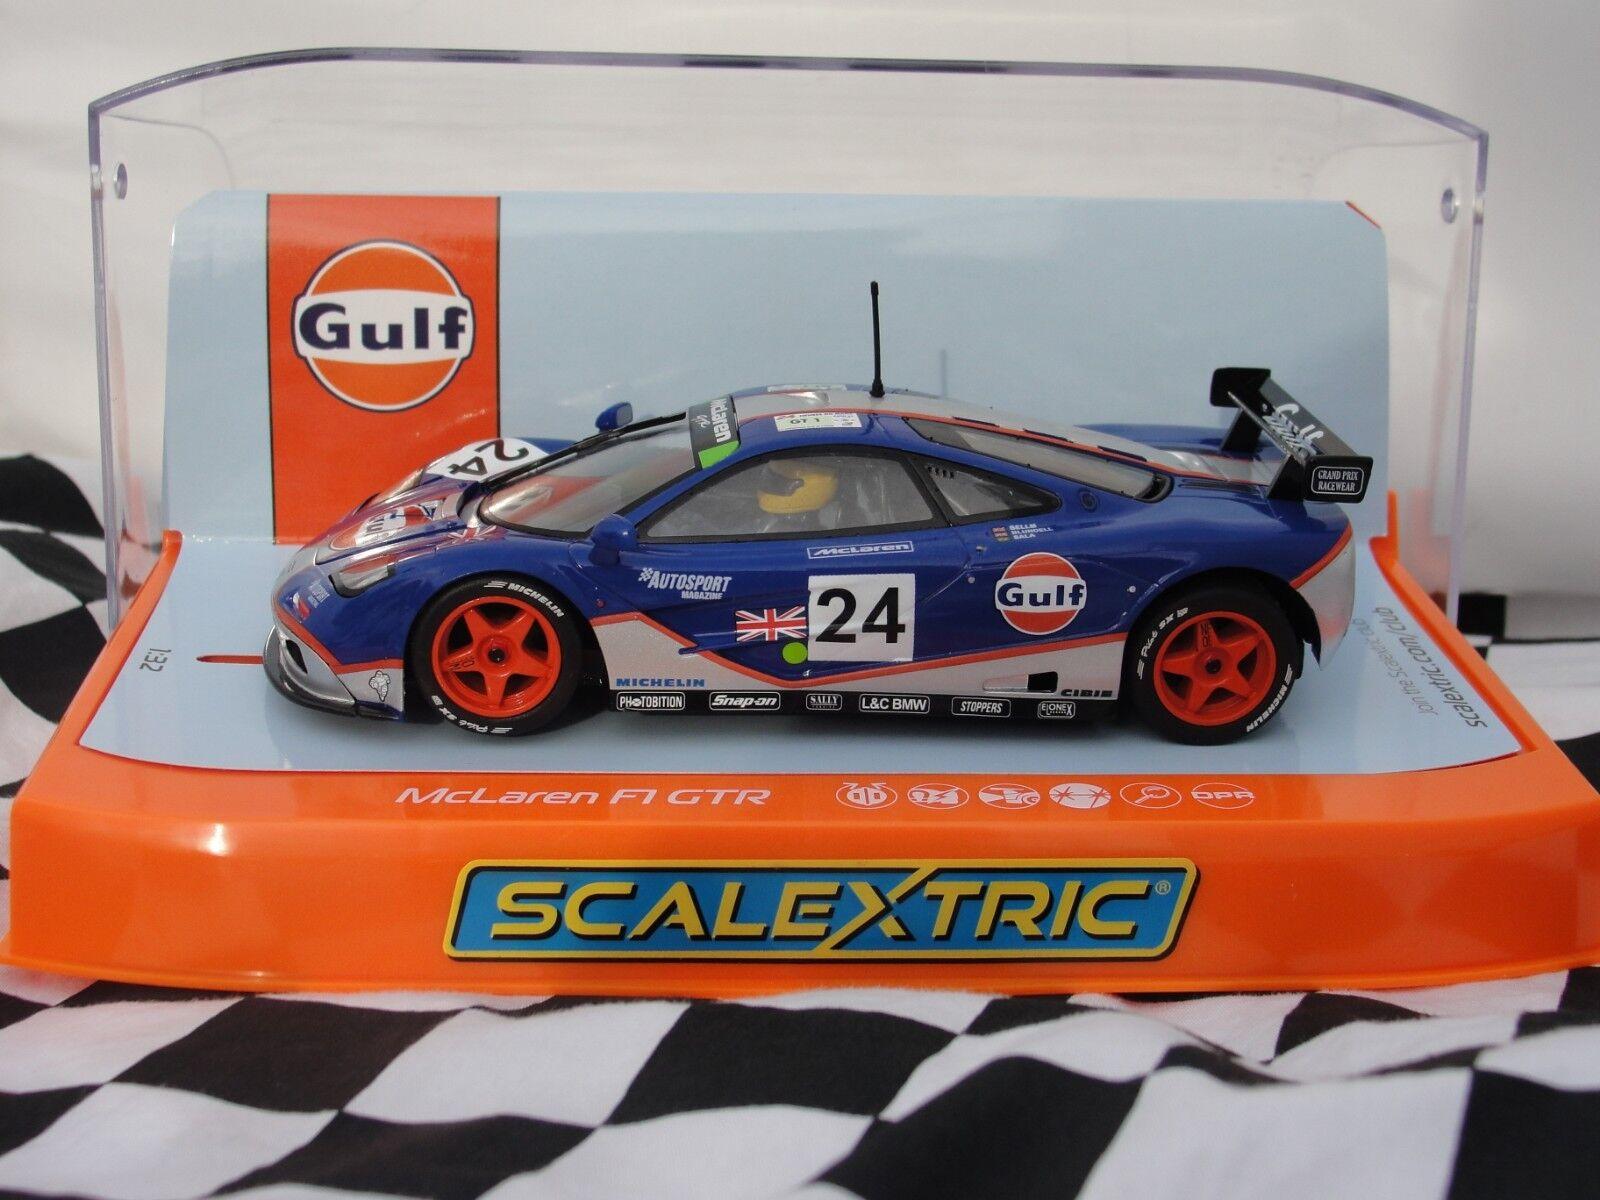 SCALEXTRIC MCLAREN  F1 GTR '24HRS LE MANS 1995'  GULF 1 32 SLOT  C3969 BNIB